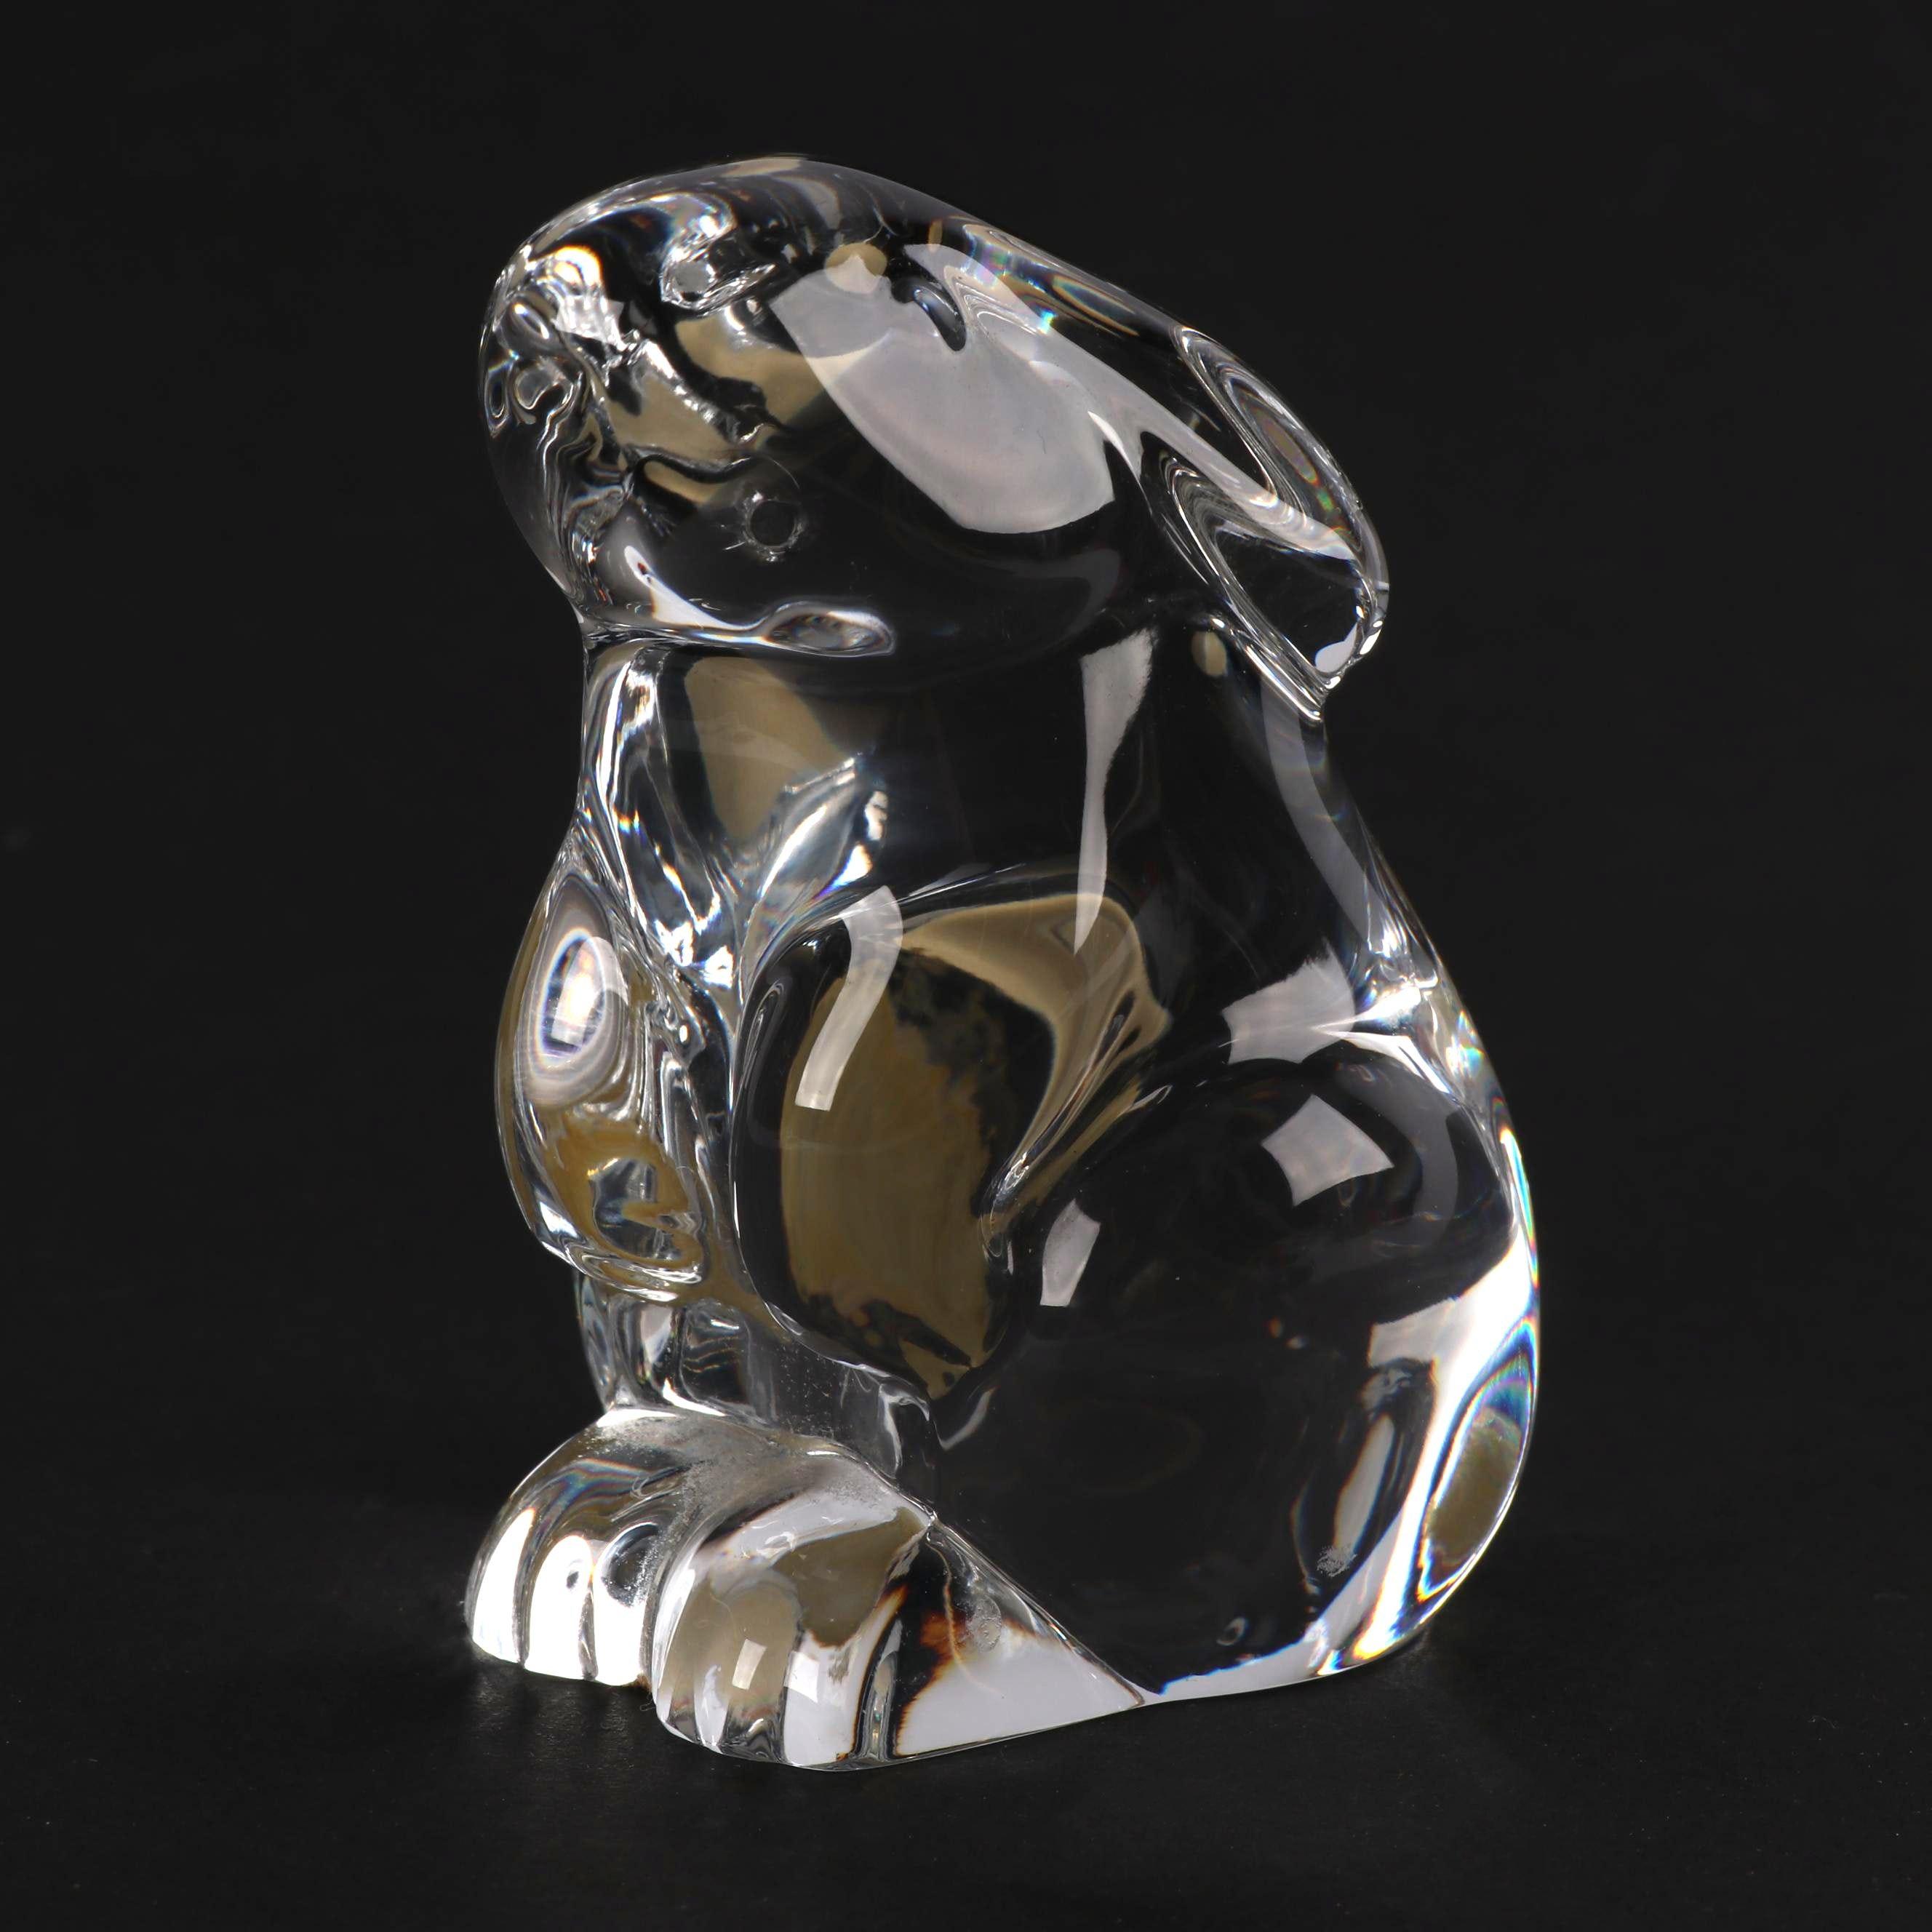 Baccarat Crystal Rabbit Hand Cooler